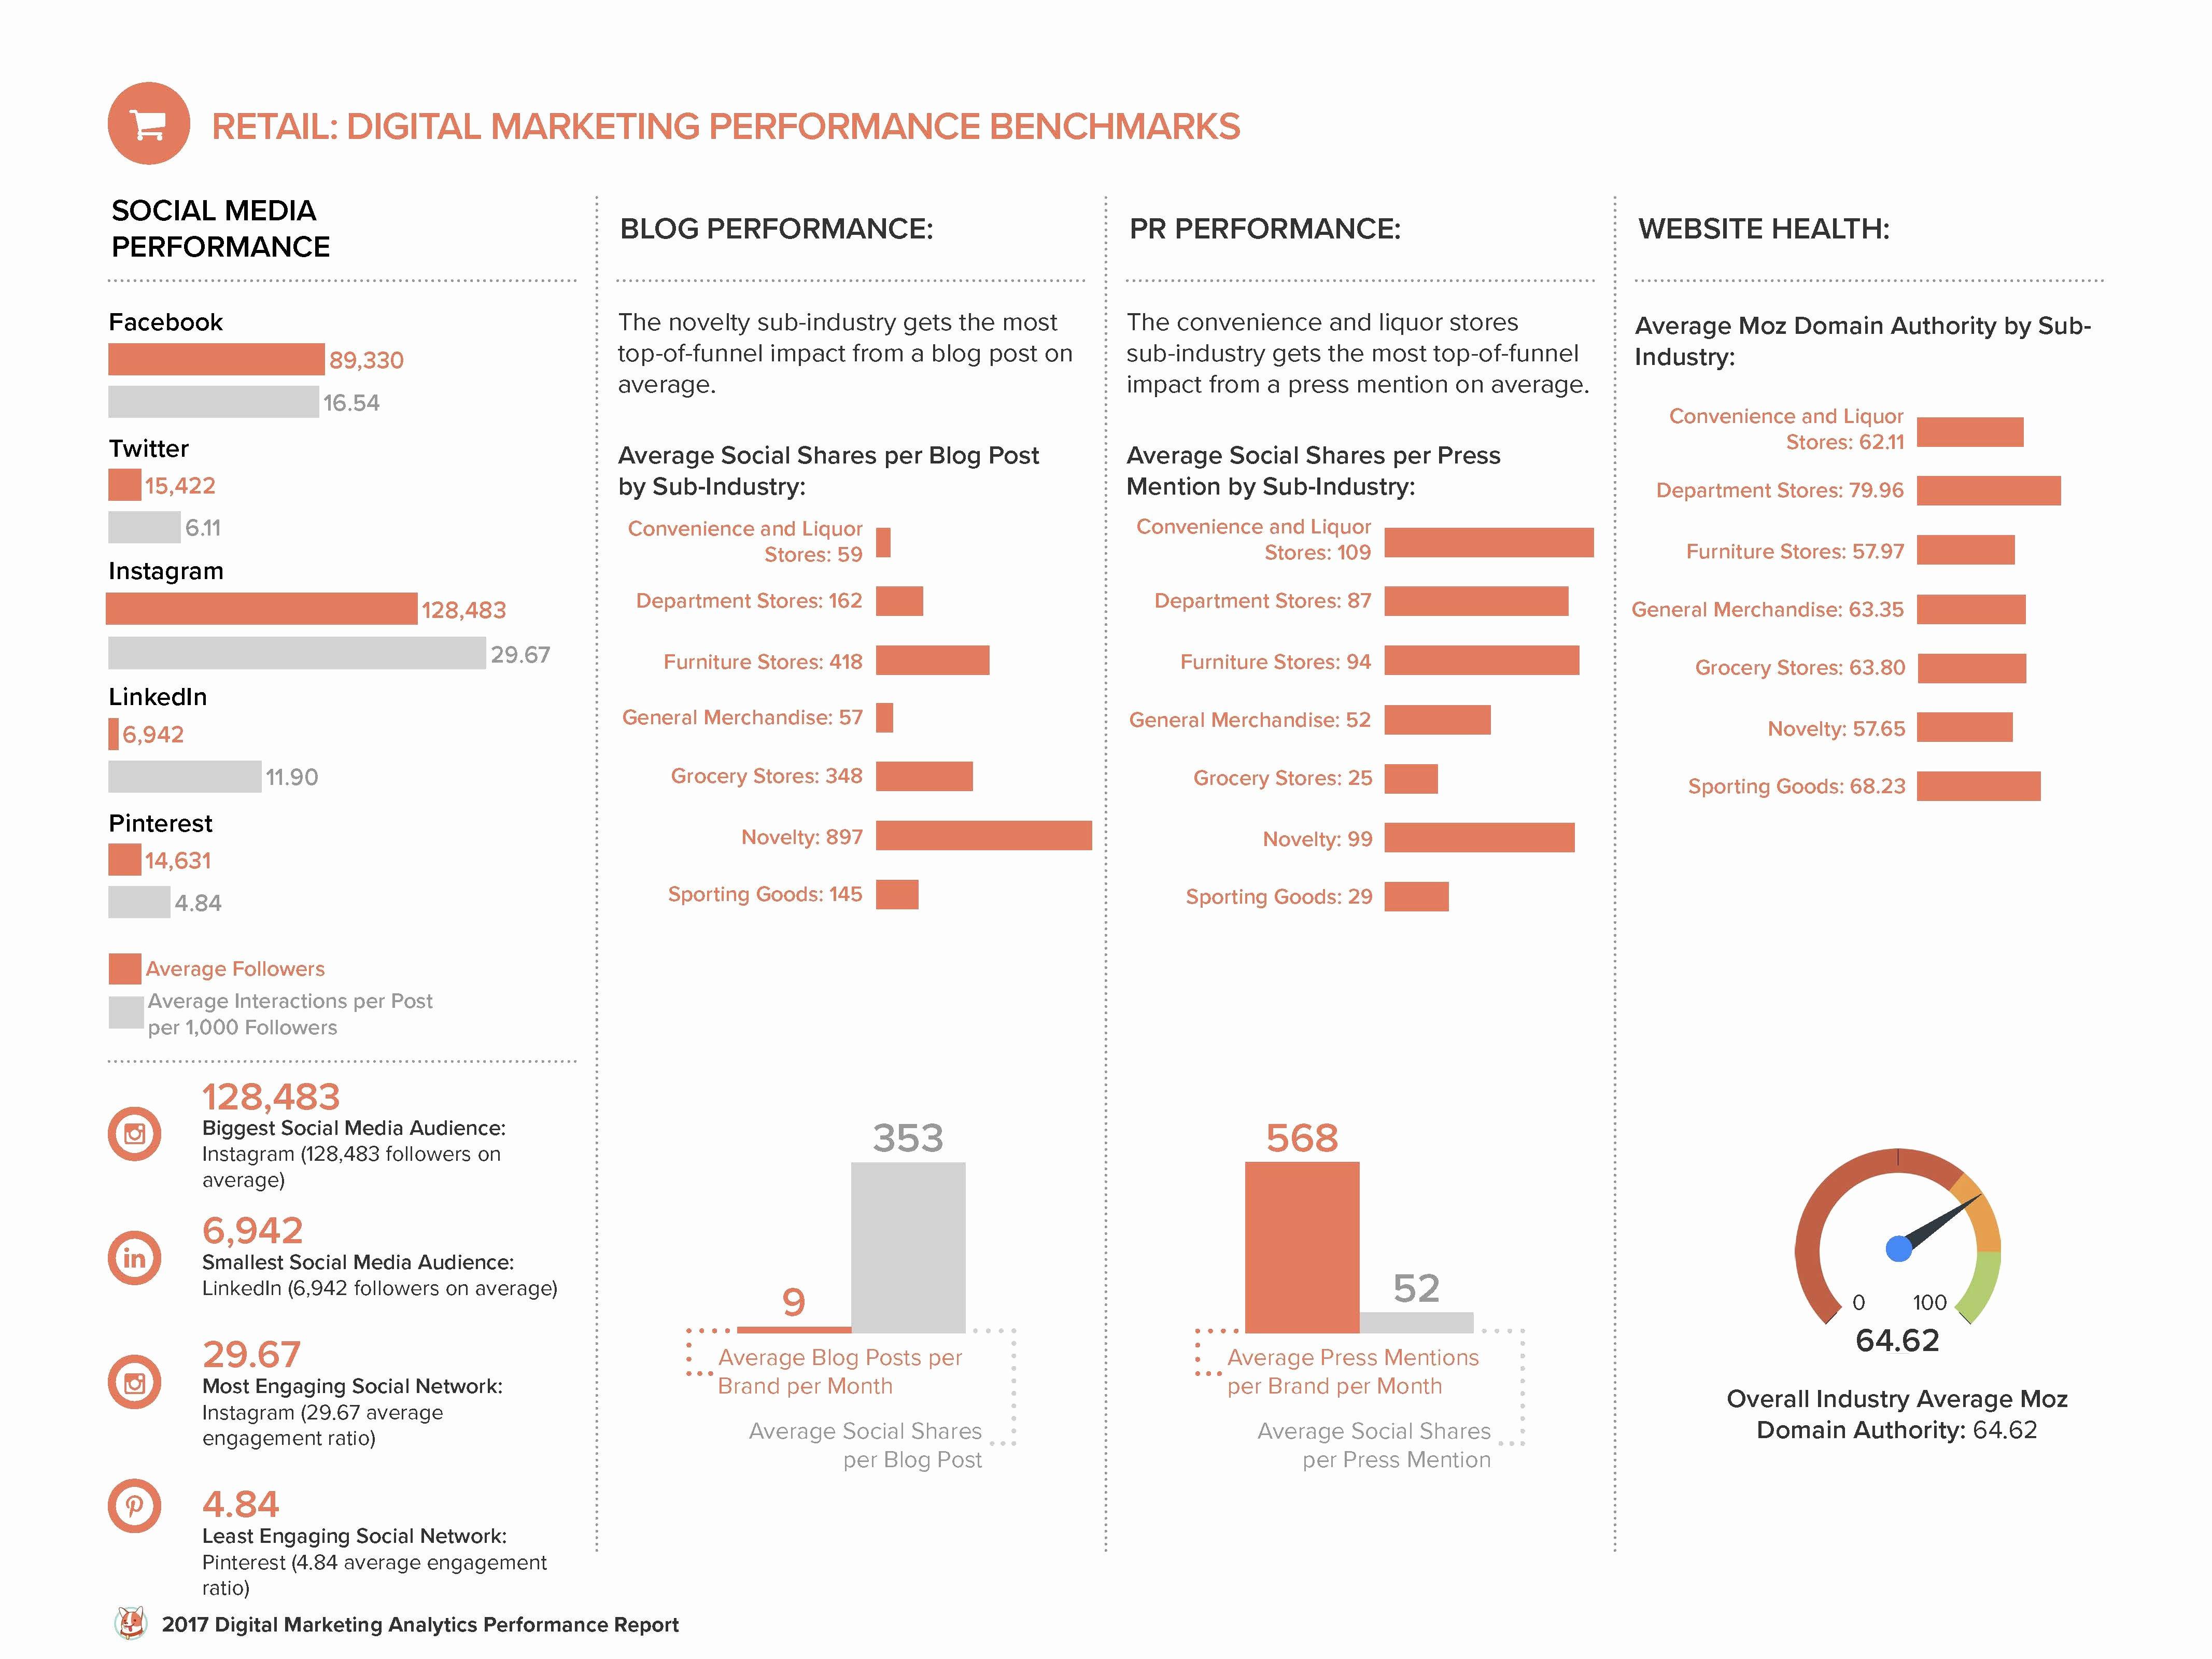 Digital Marketing Report Template Luxury Digital Marketing Analytics Benchmarks by Industry [free